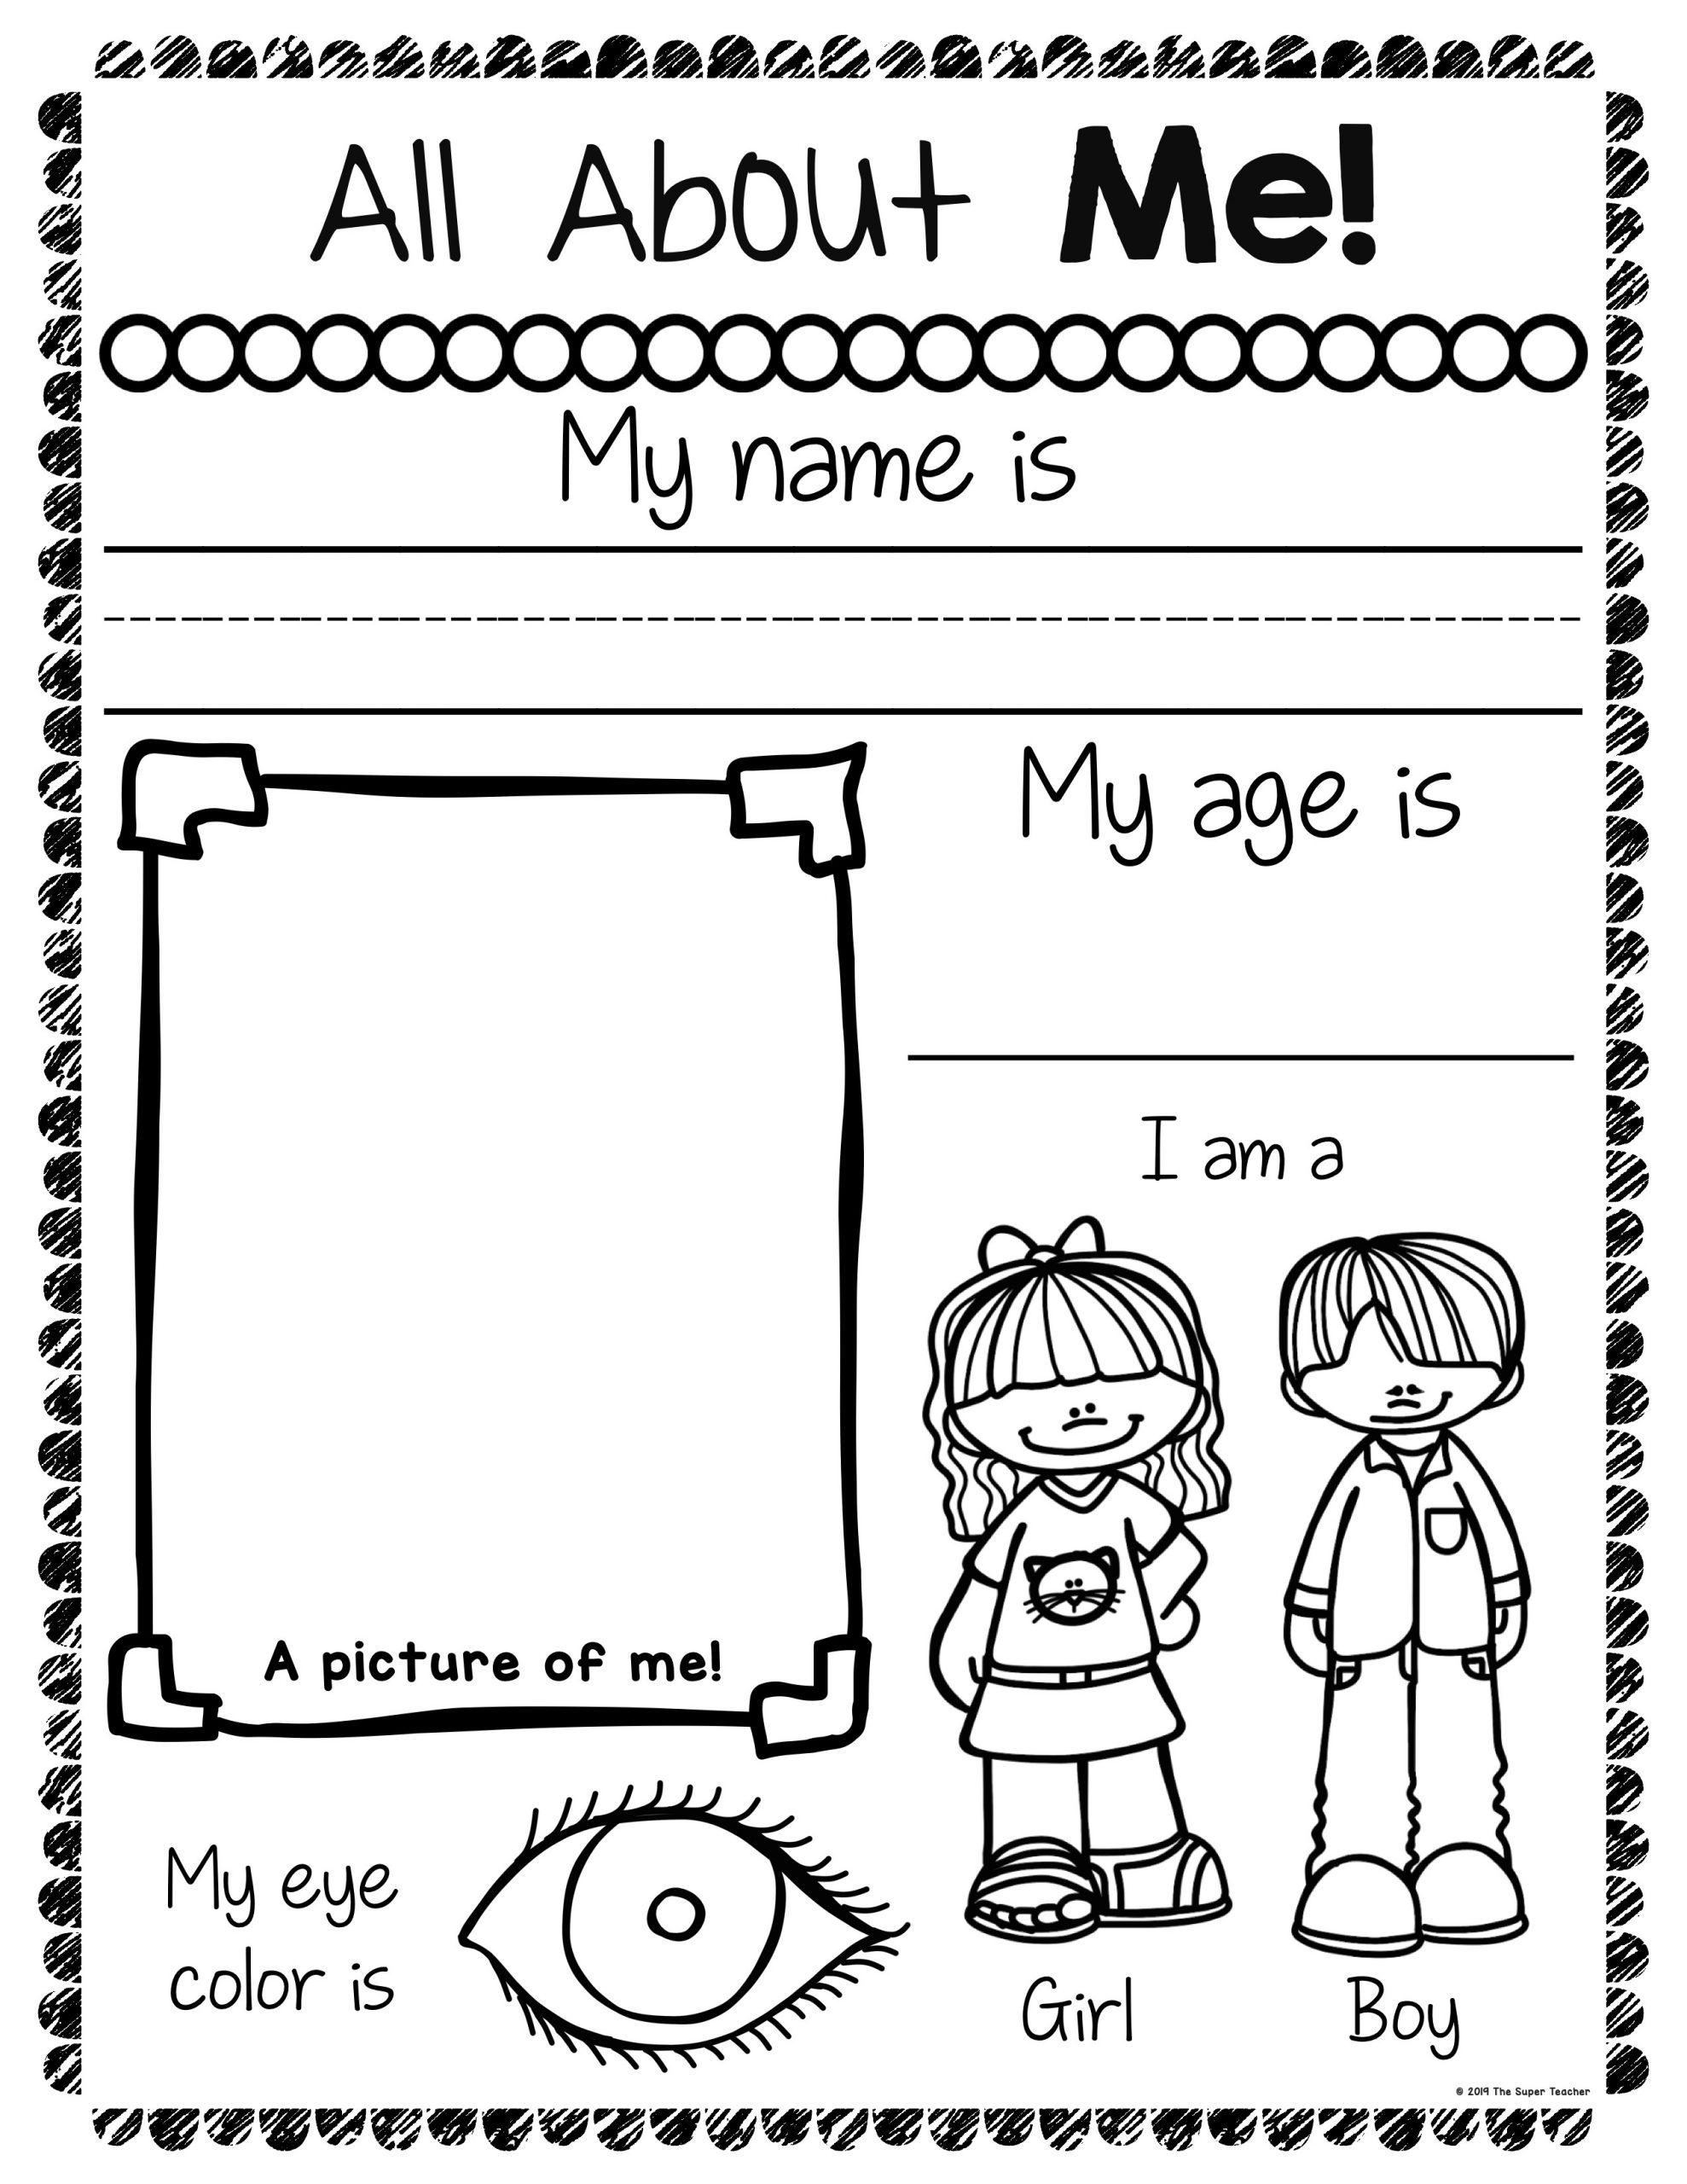 All About Me Worksheet All About Me Worksheets